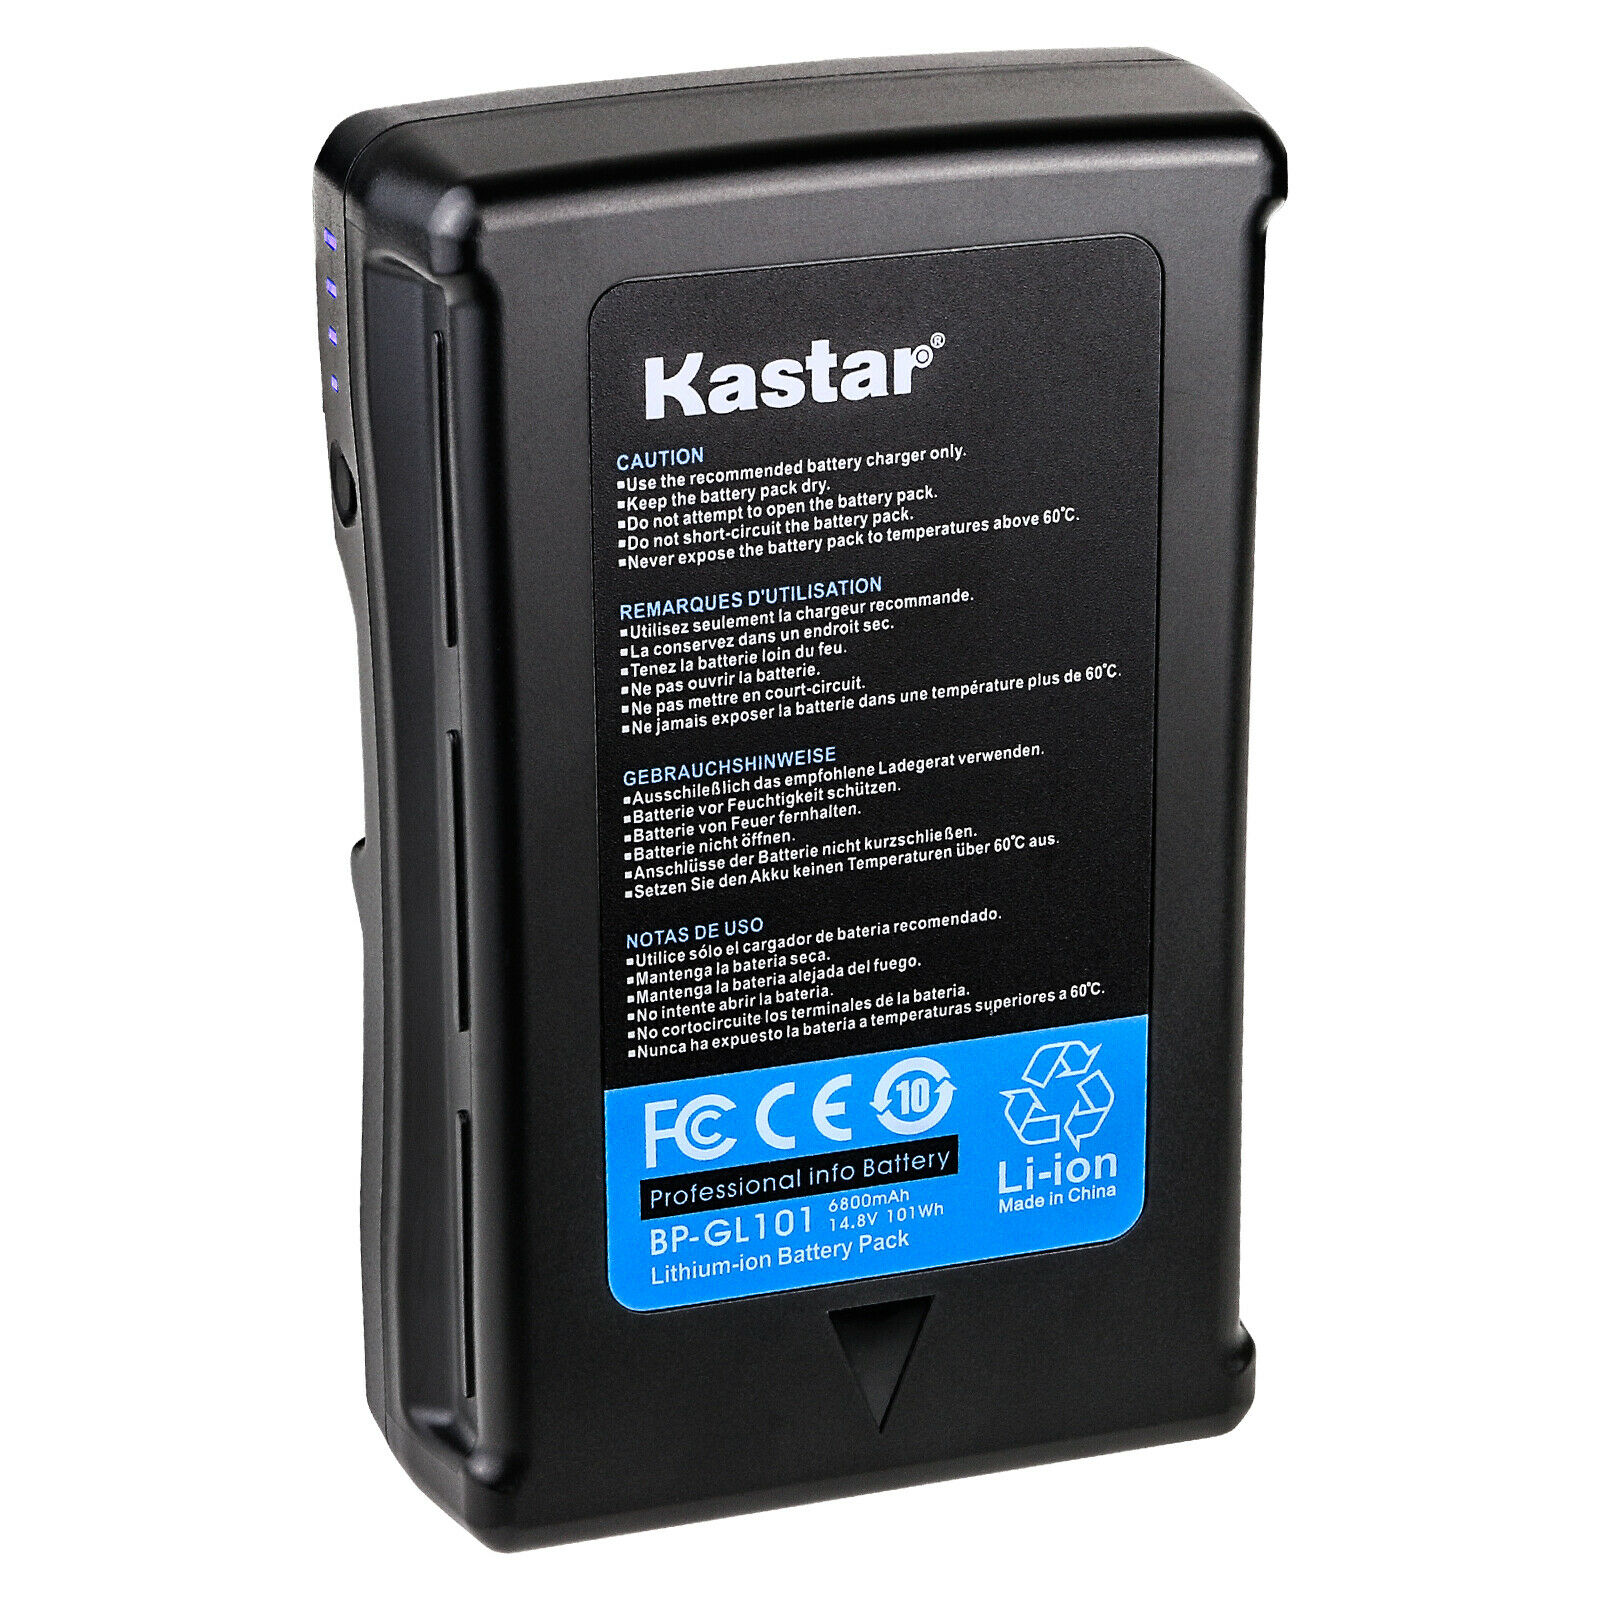 batería de extensión para sony np fp30 fp50 fp70 fp90 Batería